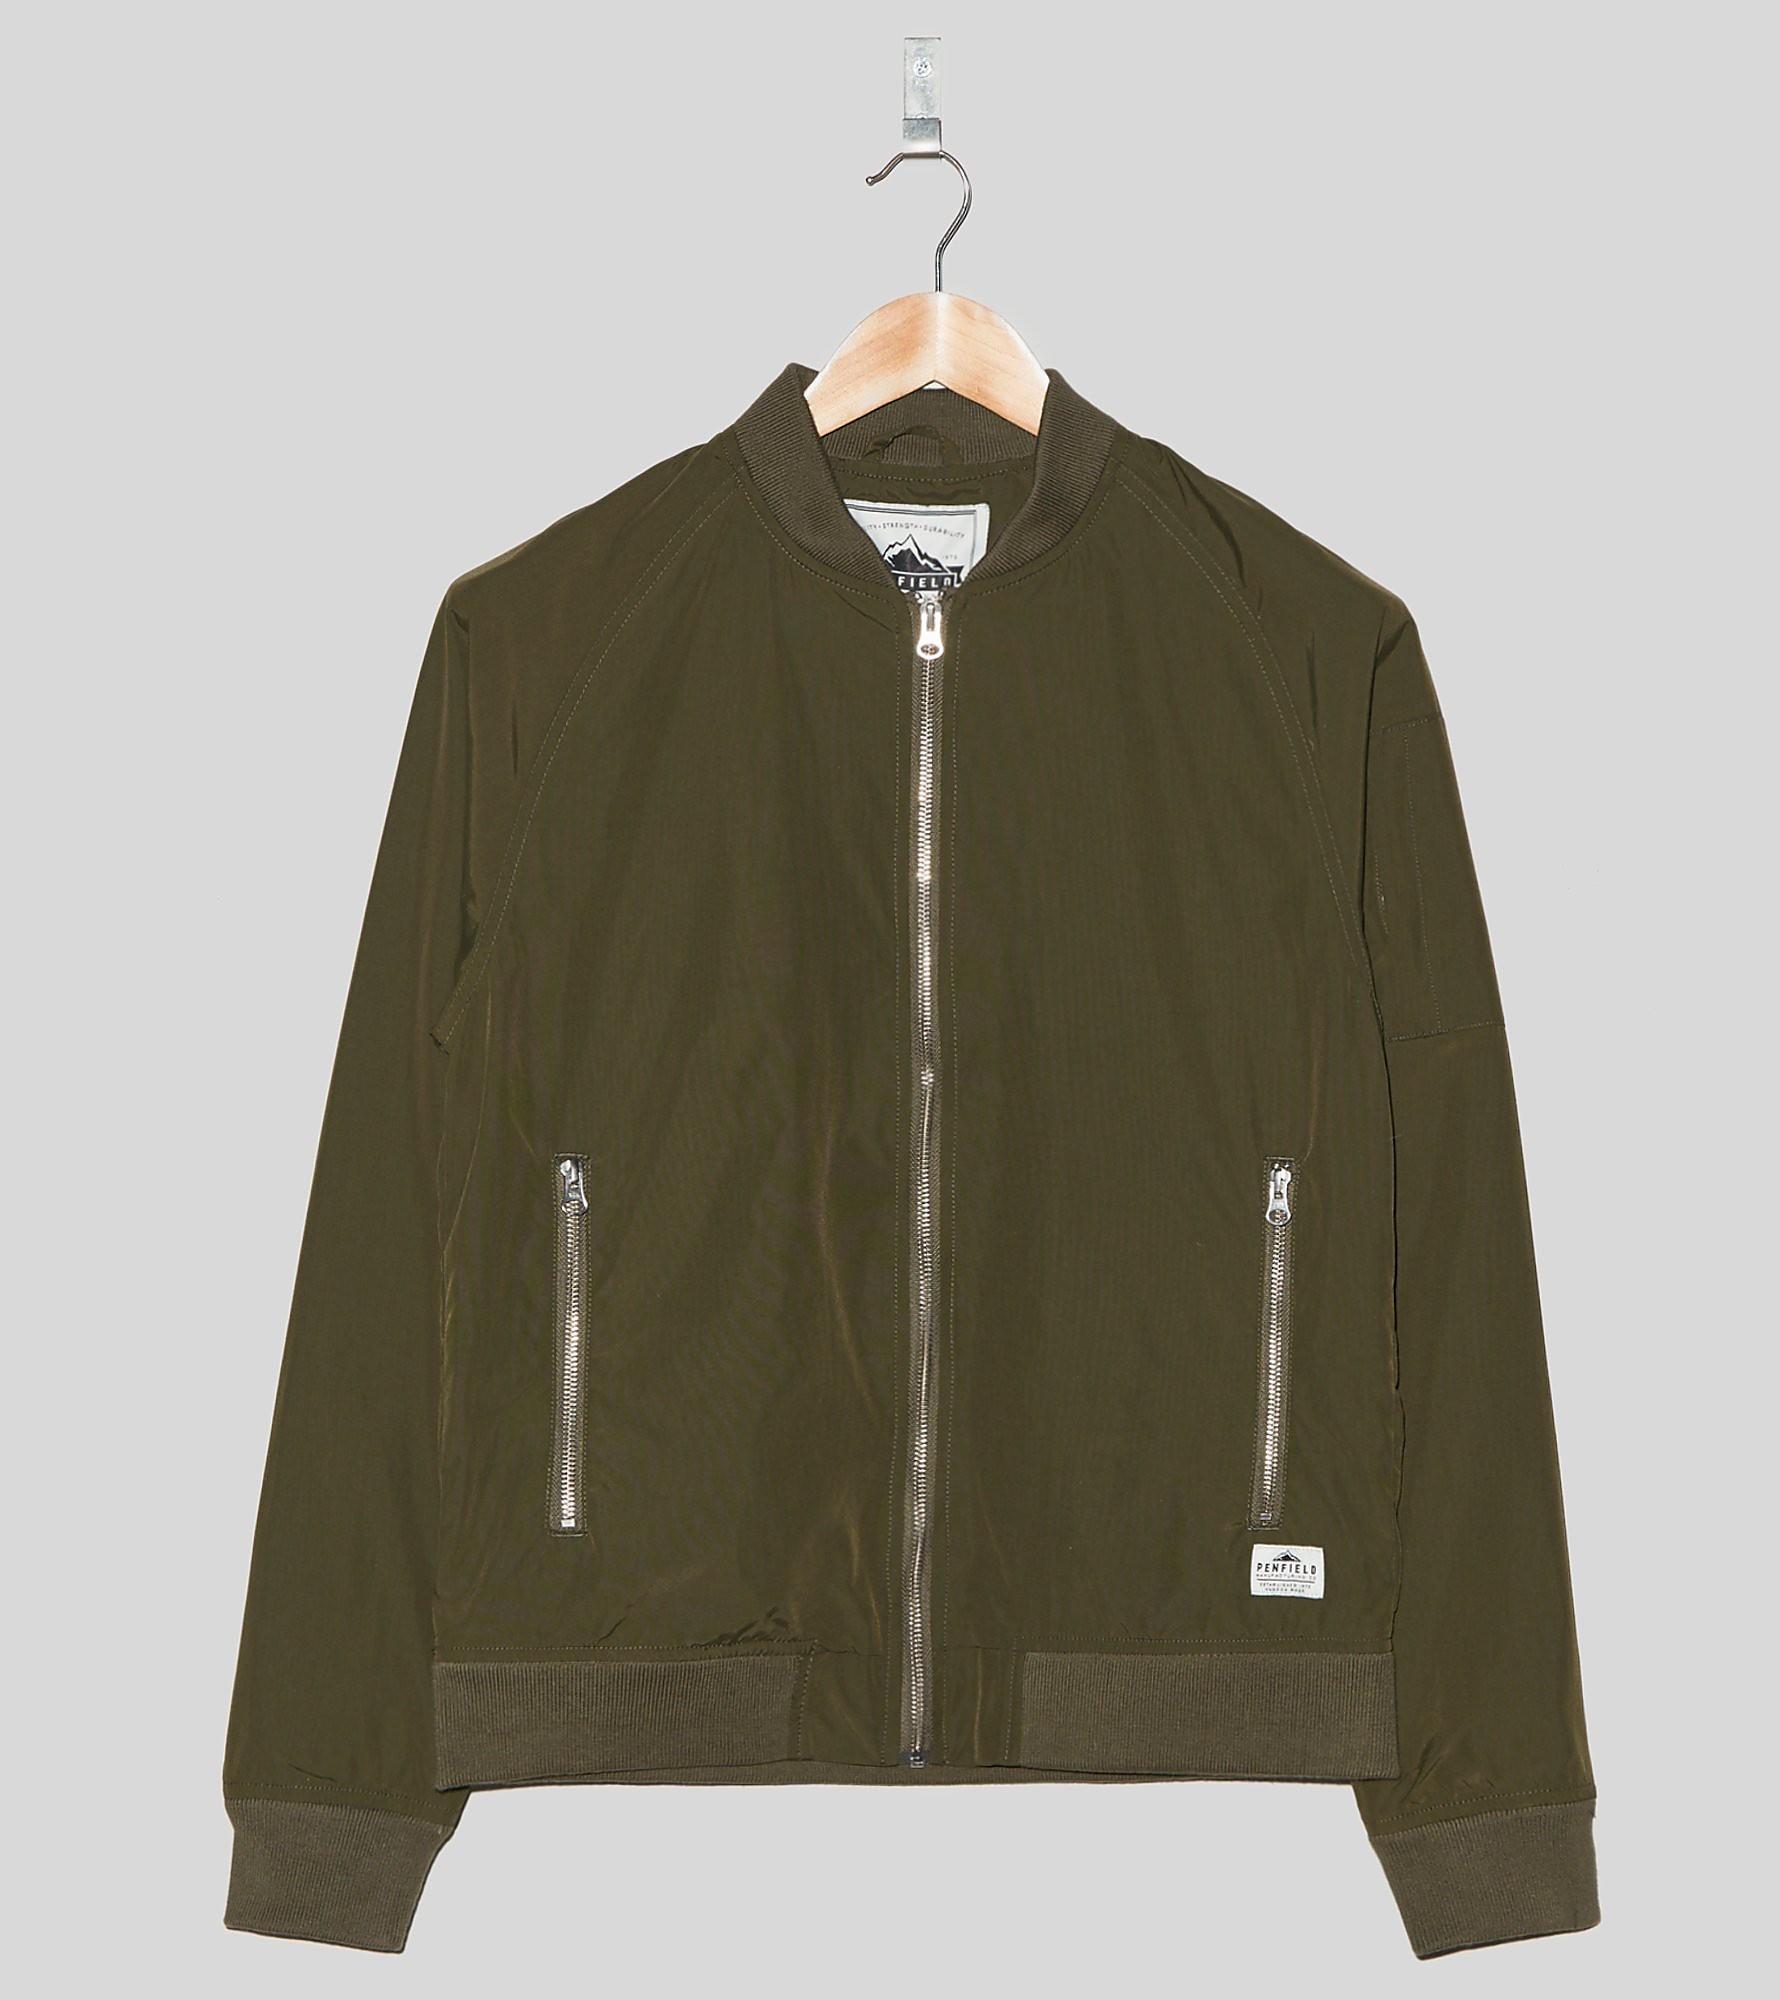 Penfield Okenfield Bomber Jacket